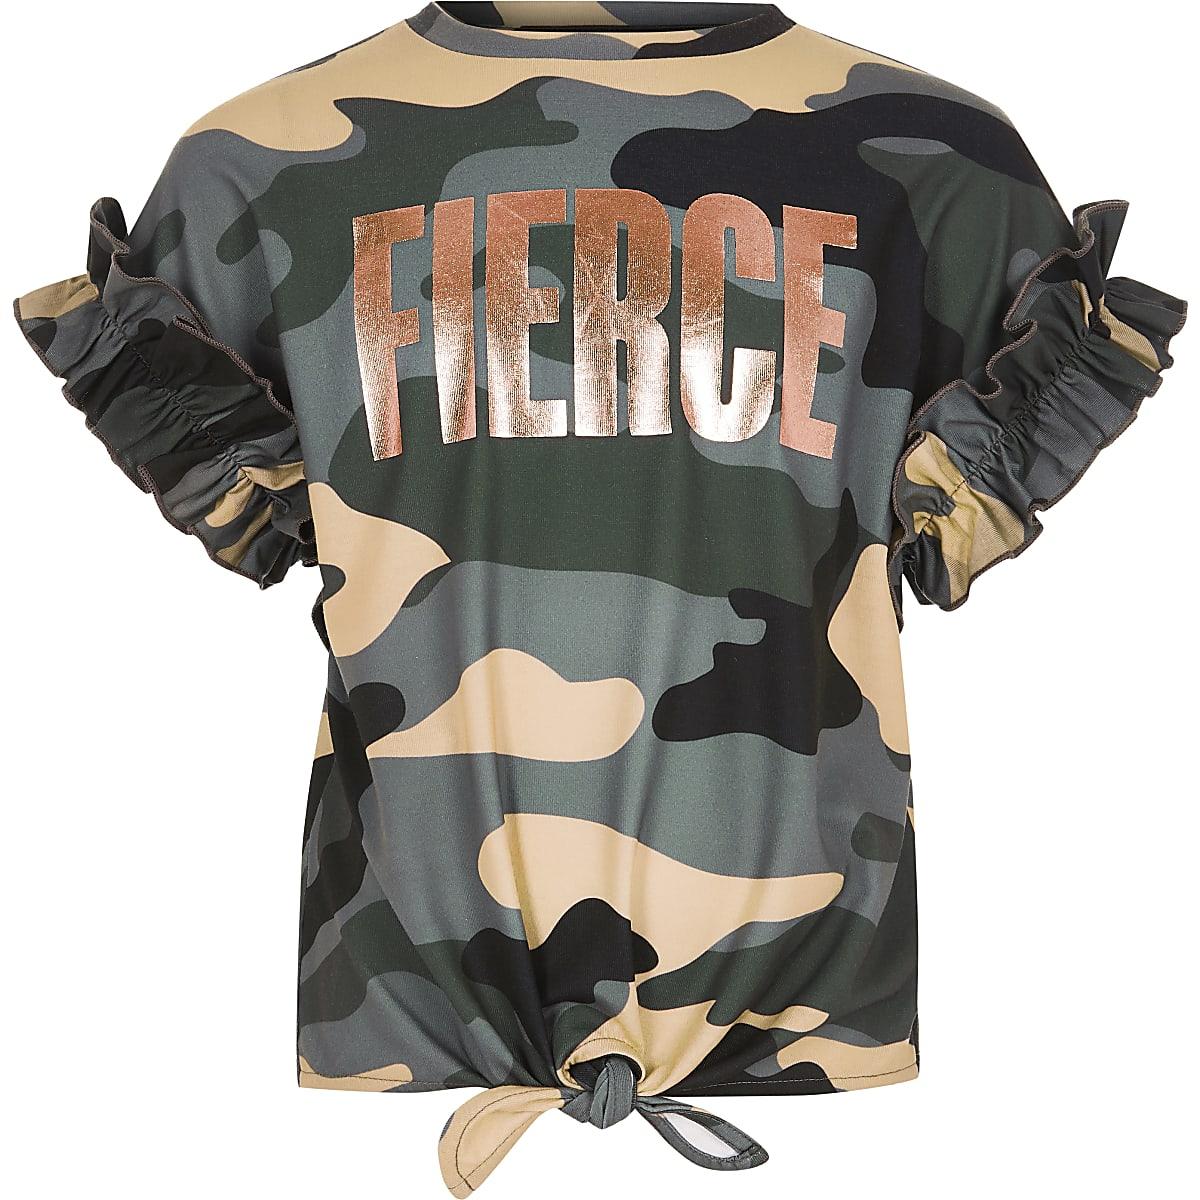 Girls khaki camo 'Fierce' T-shirt